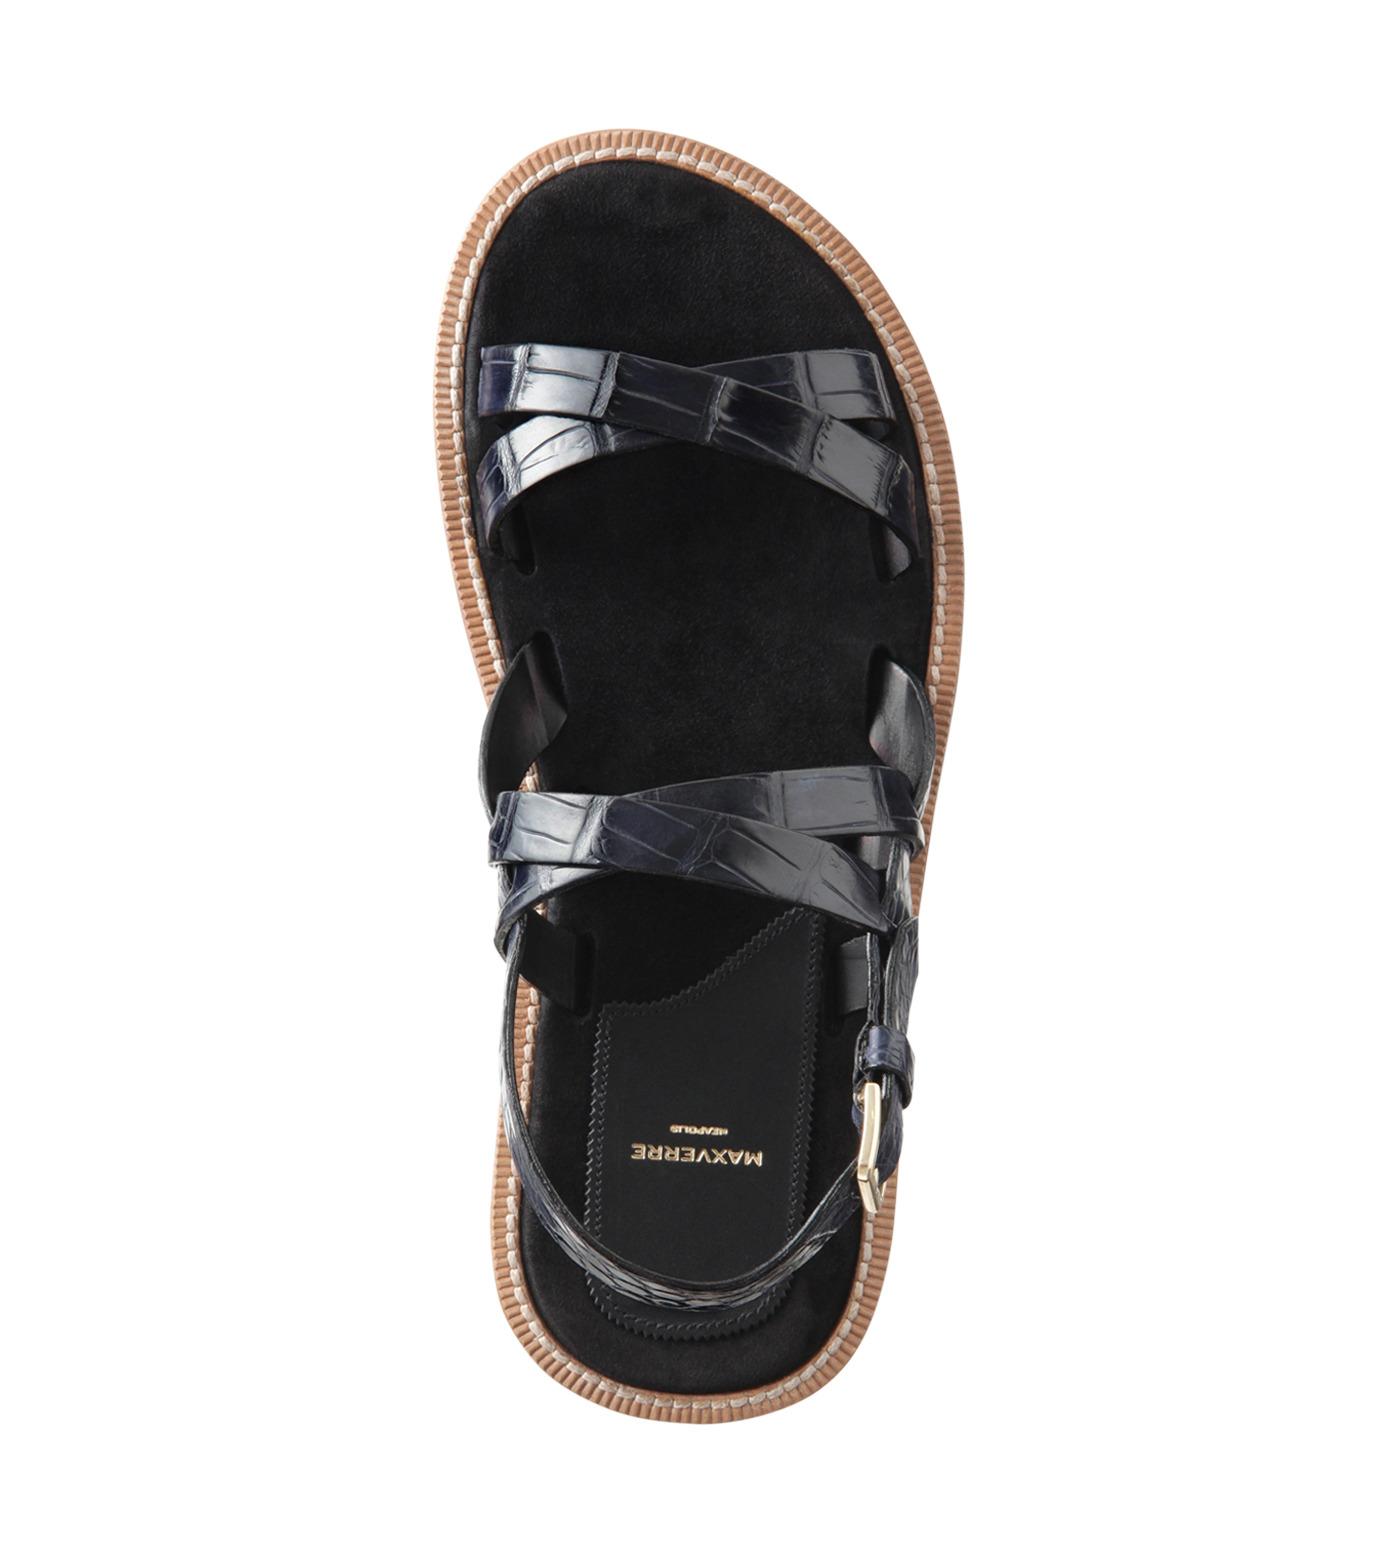 Max Verre(マックス ヴェッレ)のCross Strap Sandal-BLUE(シューズ/shoes)-MV918-POSITA-92 拡大詳細画像5